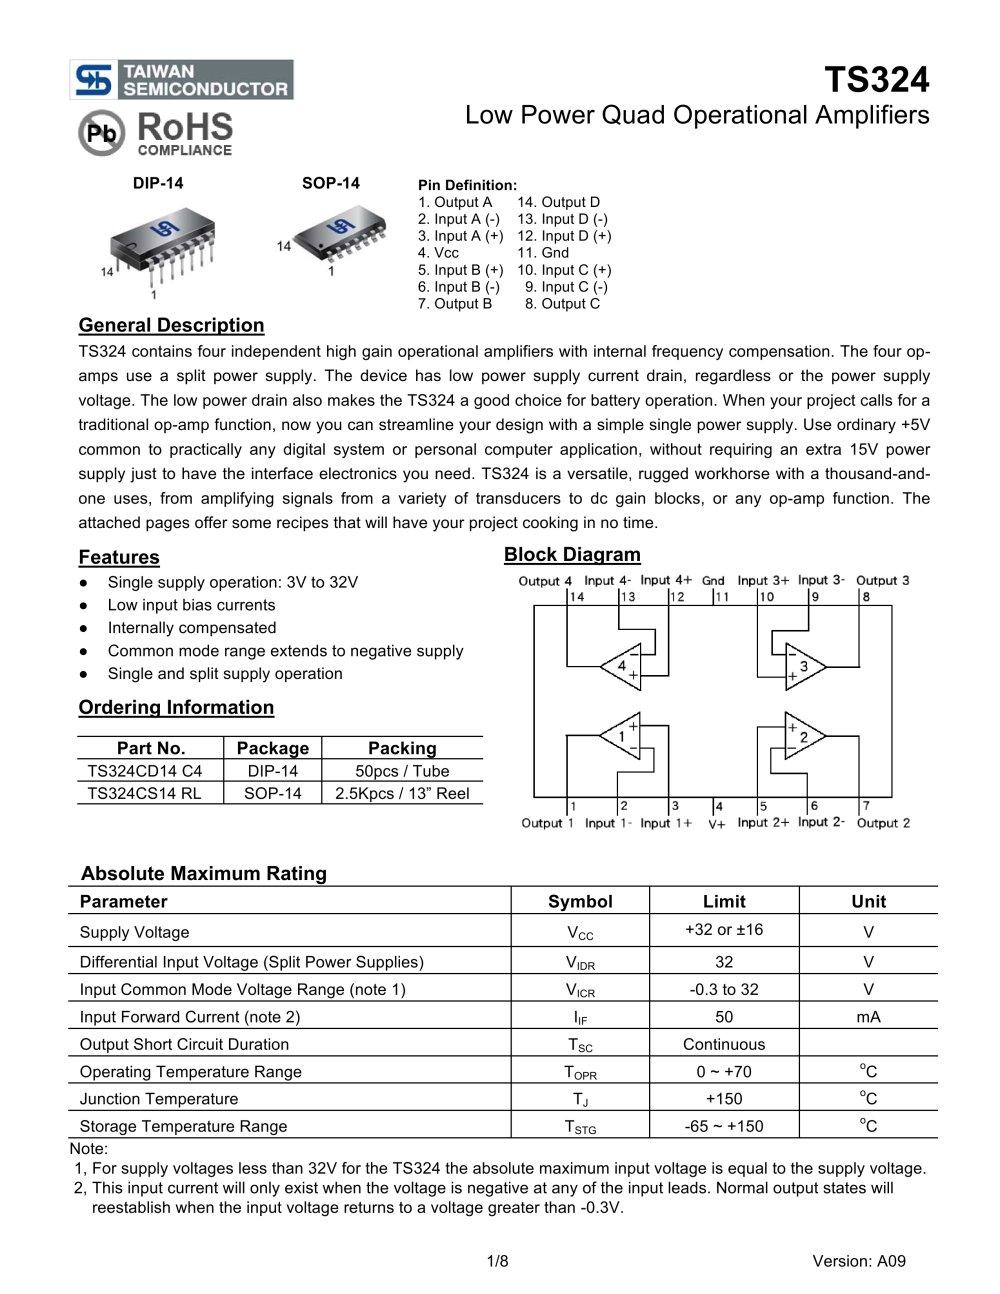 Operational Amplifiers Pdf